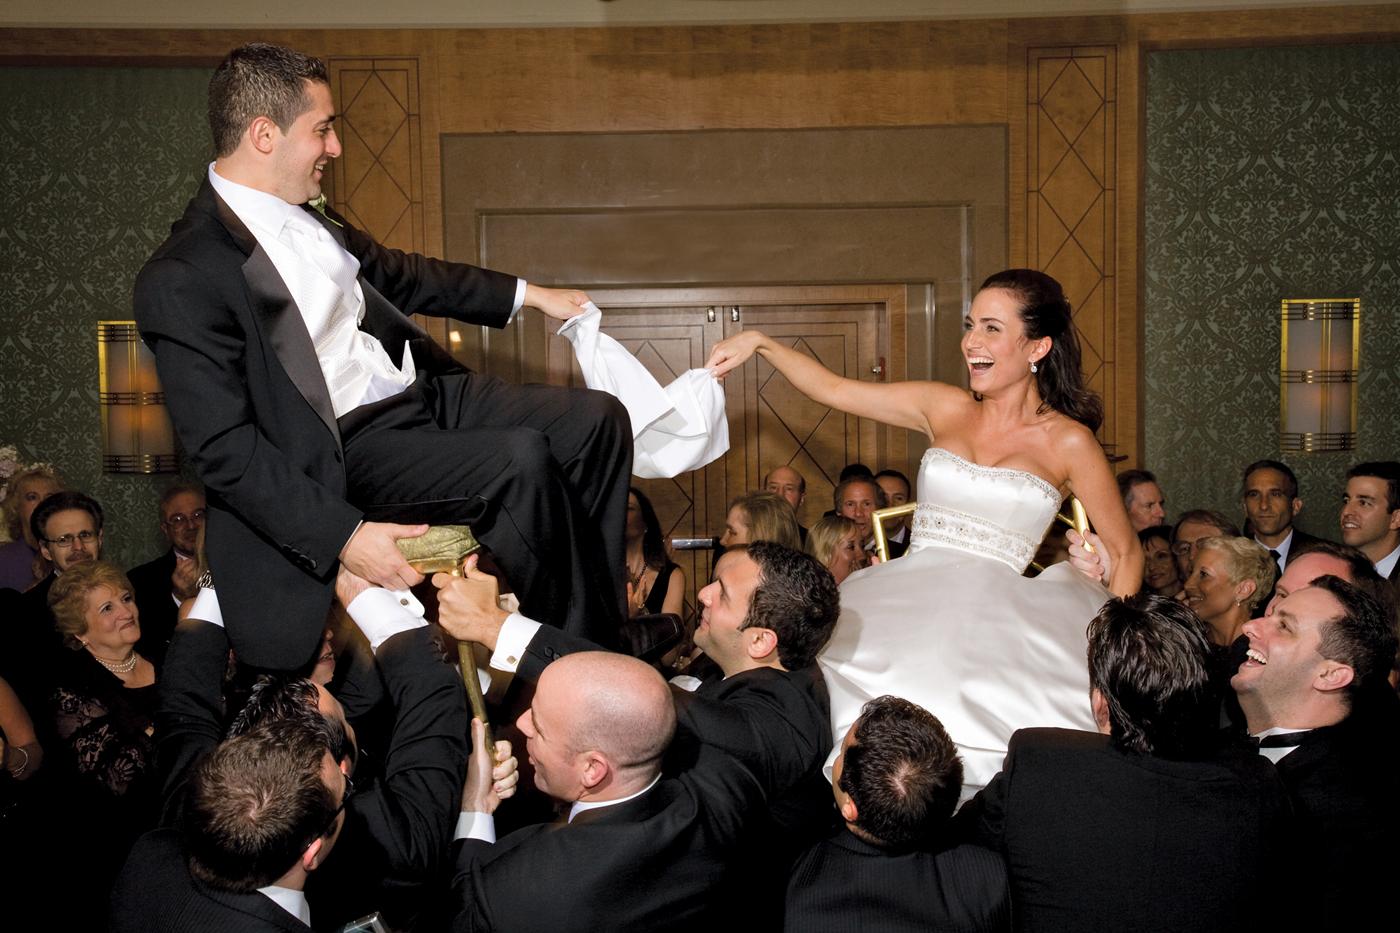 Jewish Wedding Traditions